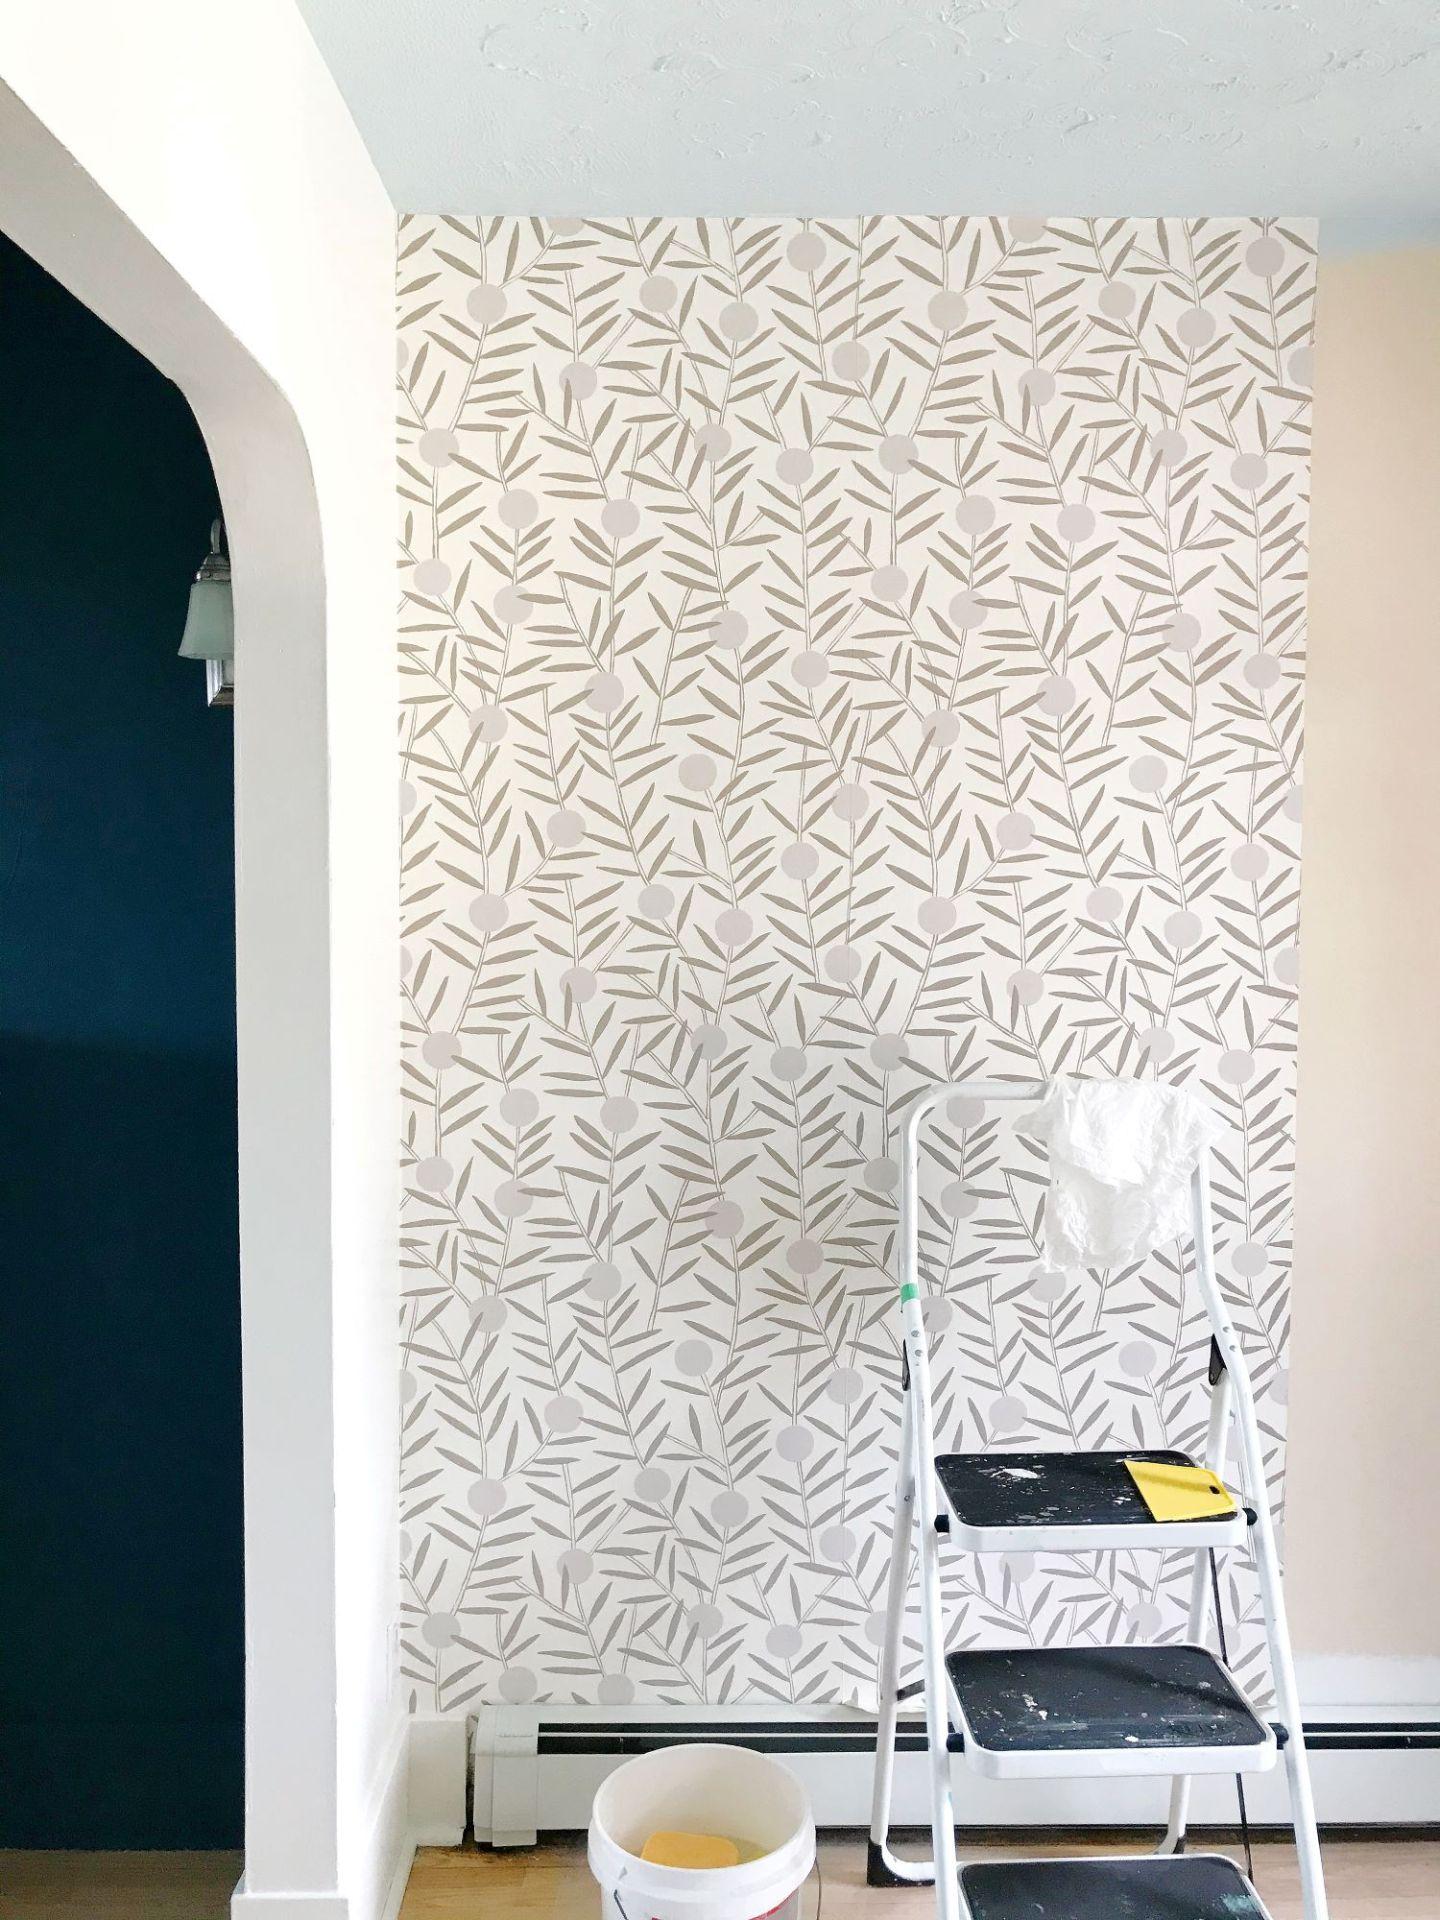 Non-Pasted Wallpaper Installation DIY